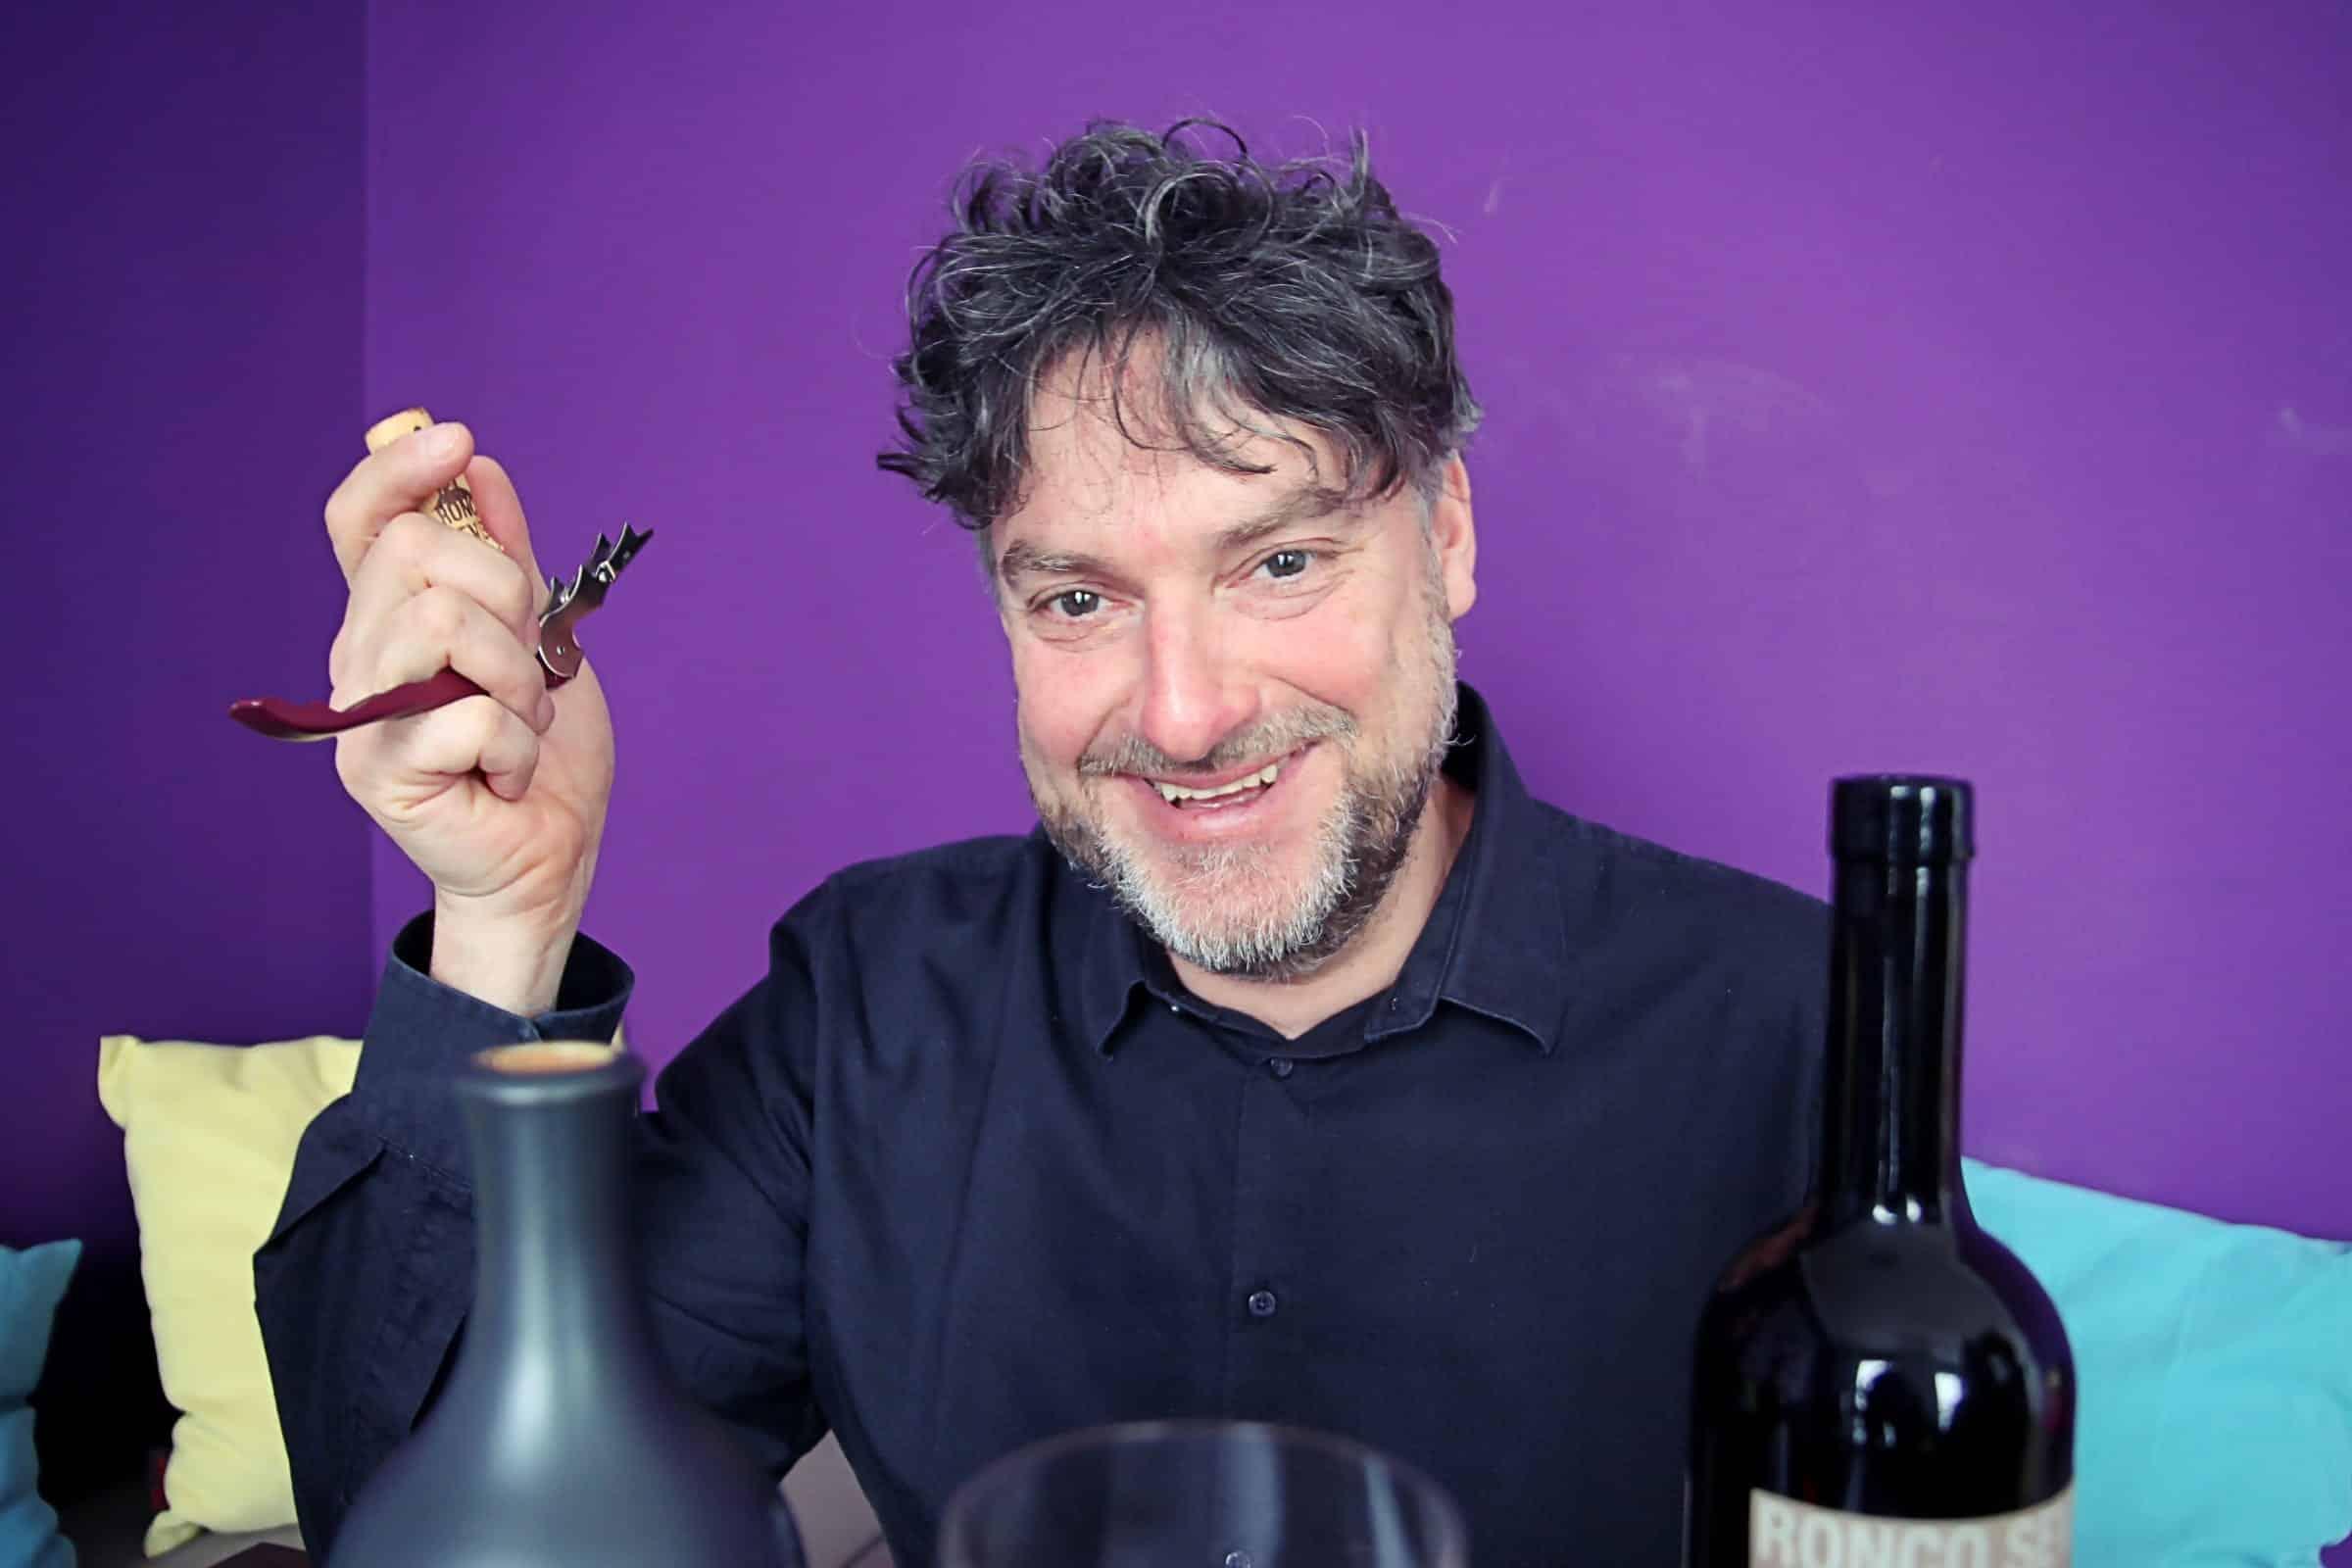 Weinexperte Wolfgang Baumeister